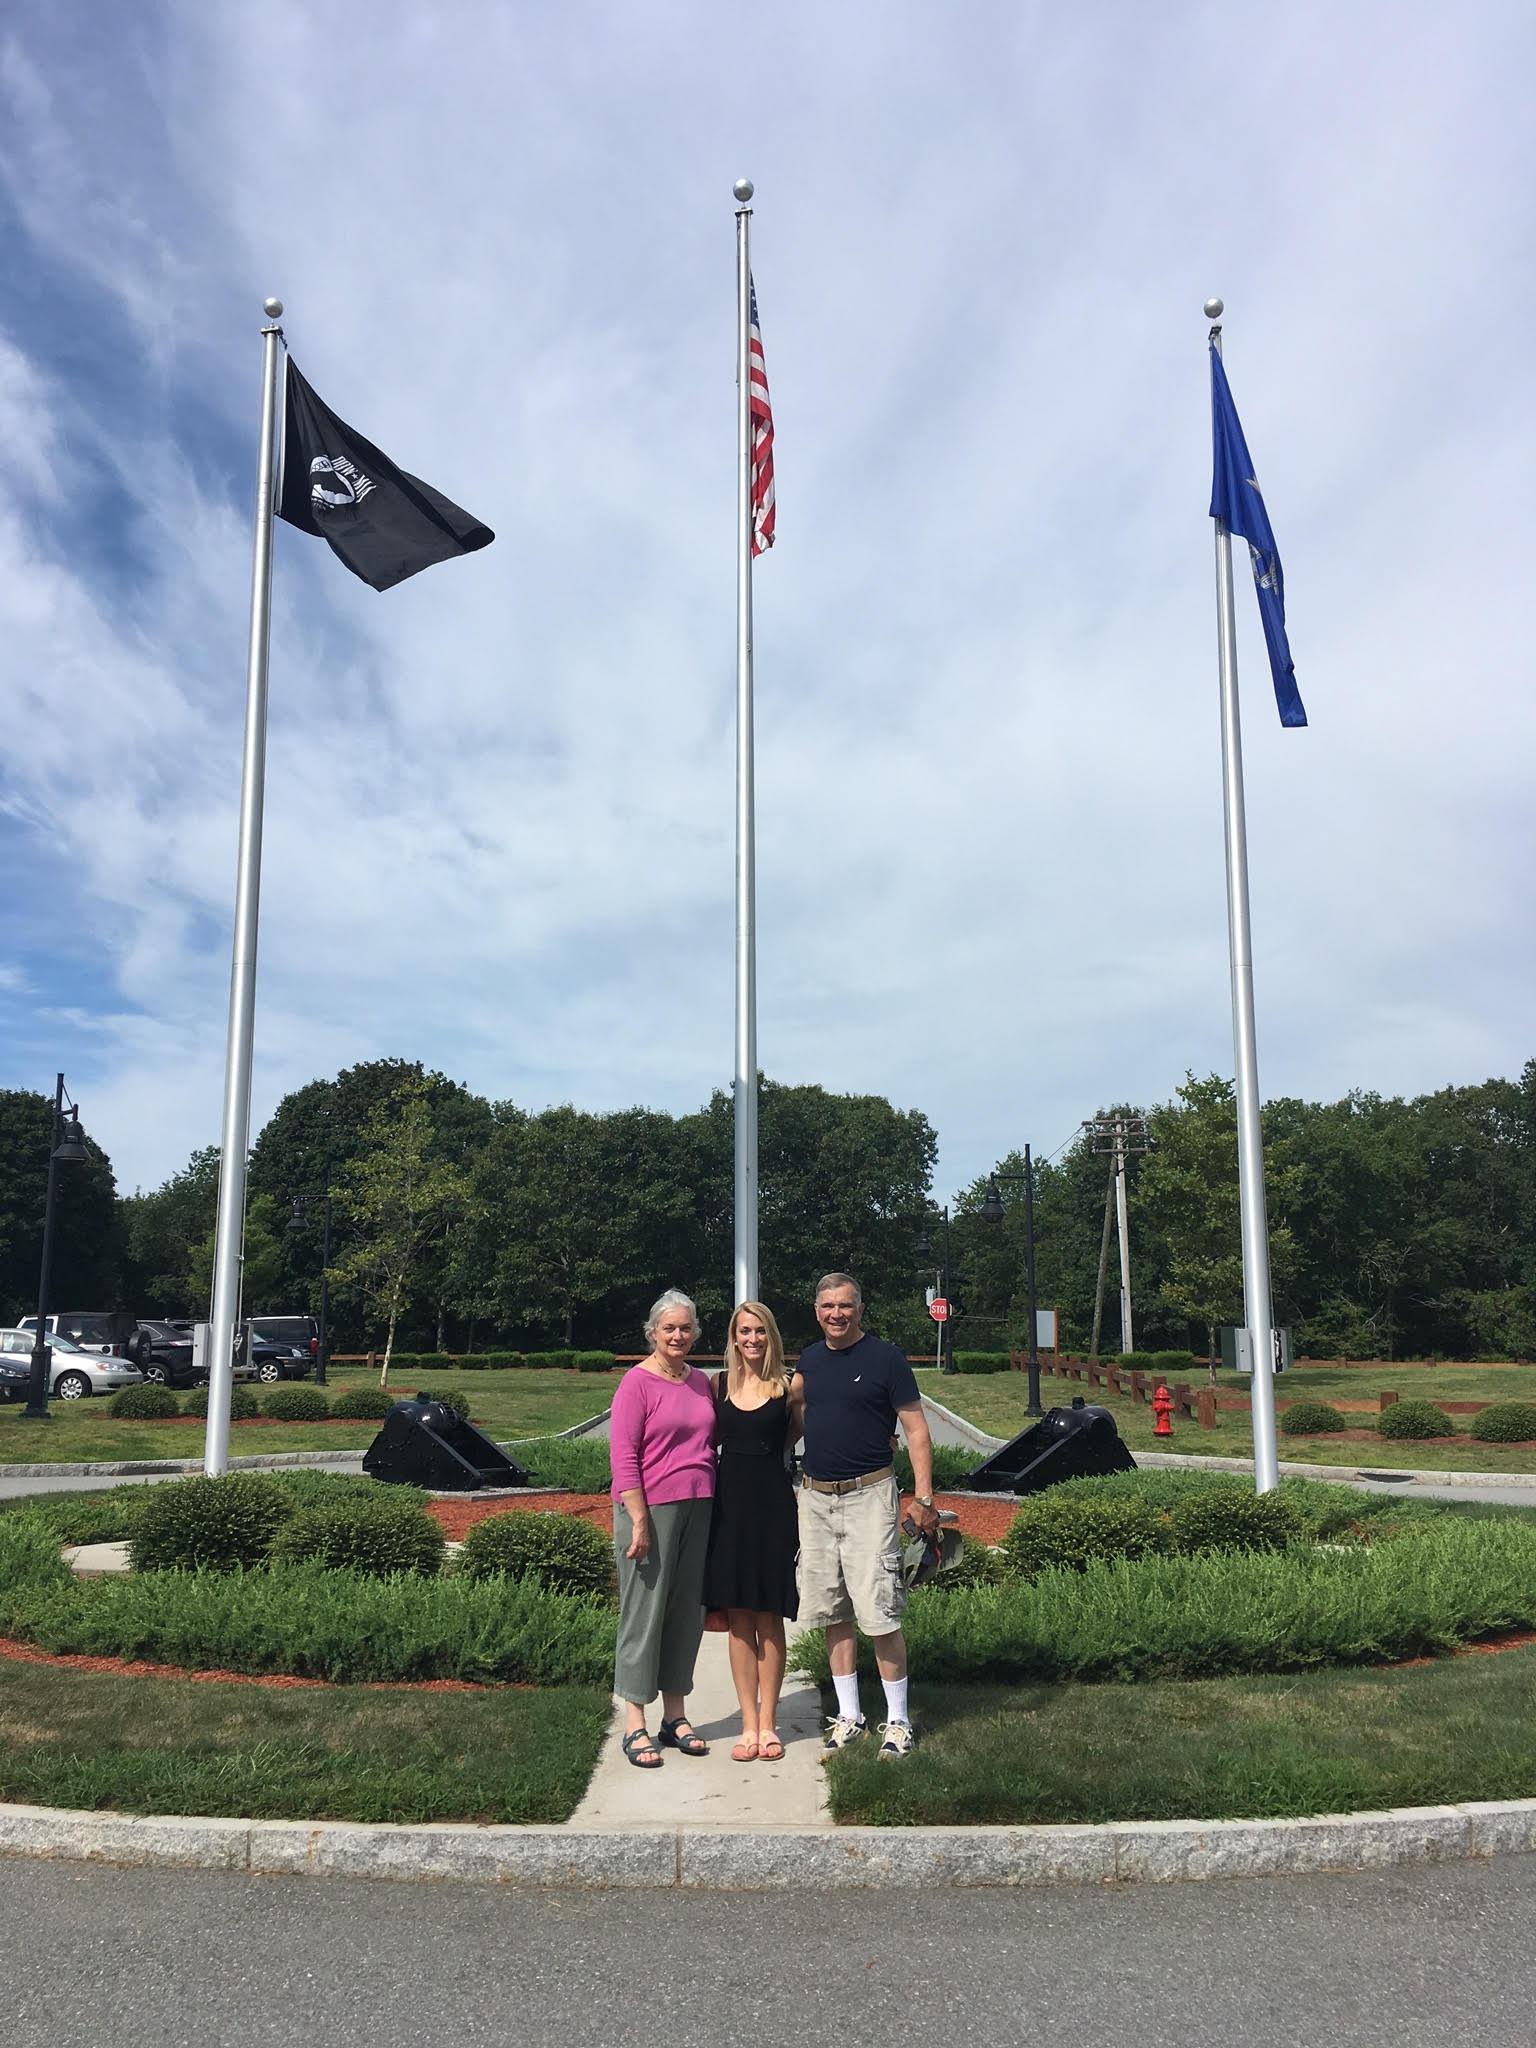 Col. David C. Smith (R) with wife, Diana and daughter Lydia Marie Elizabeth, Beonne Beronda award winner at Camp Niantic, Niantic CT..jpg